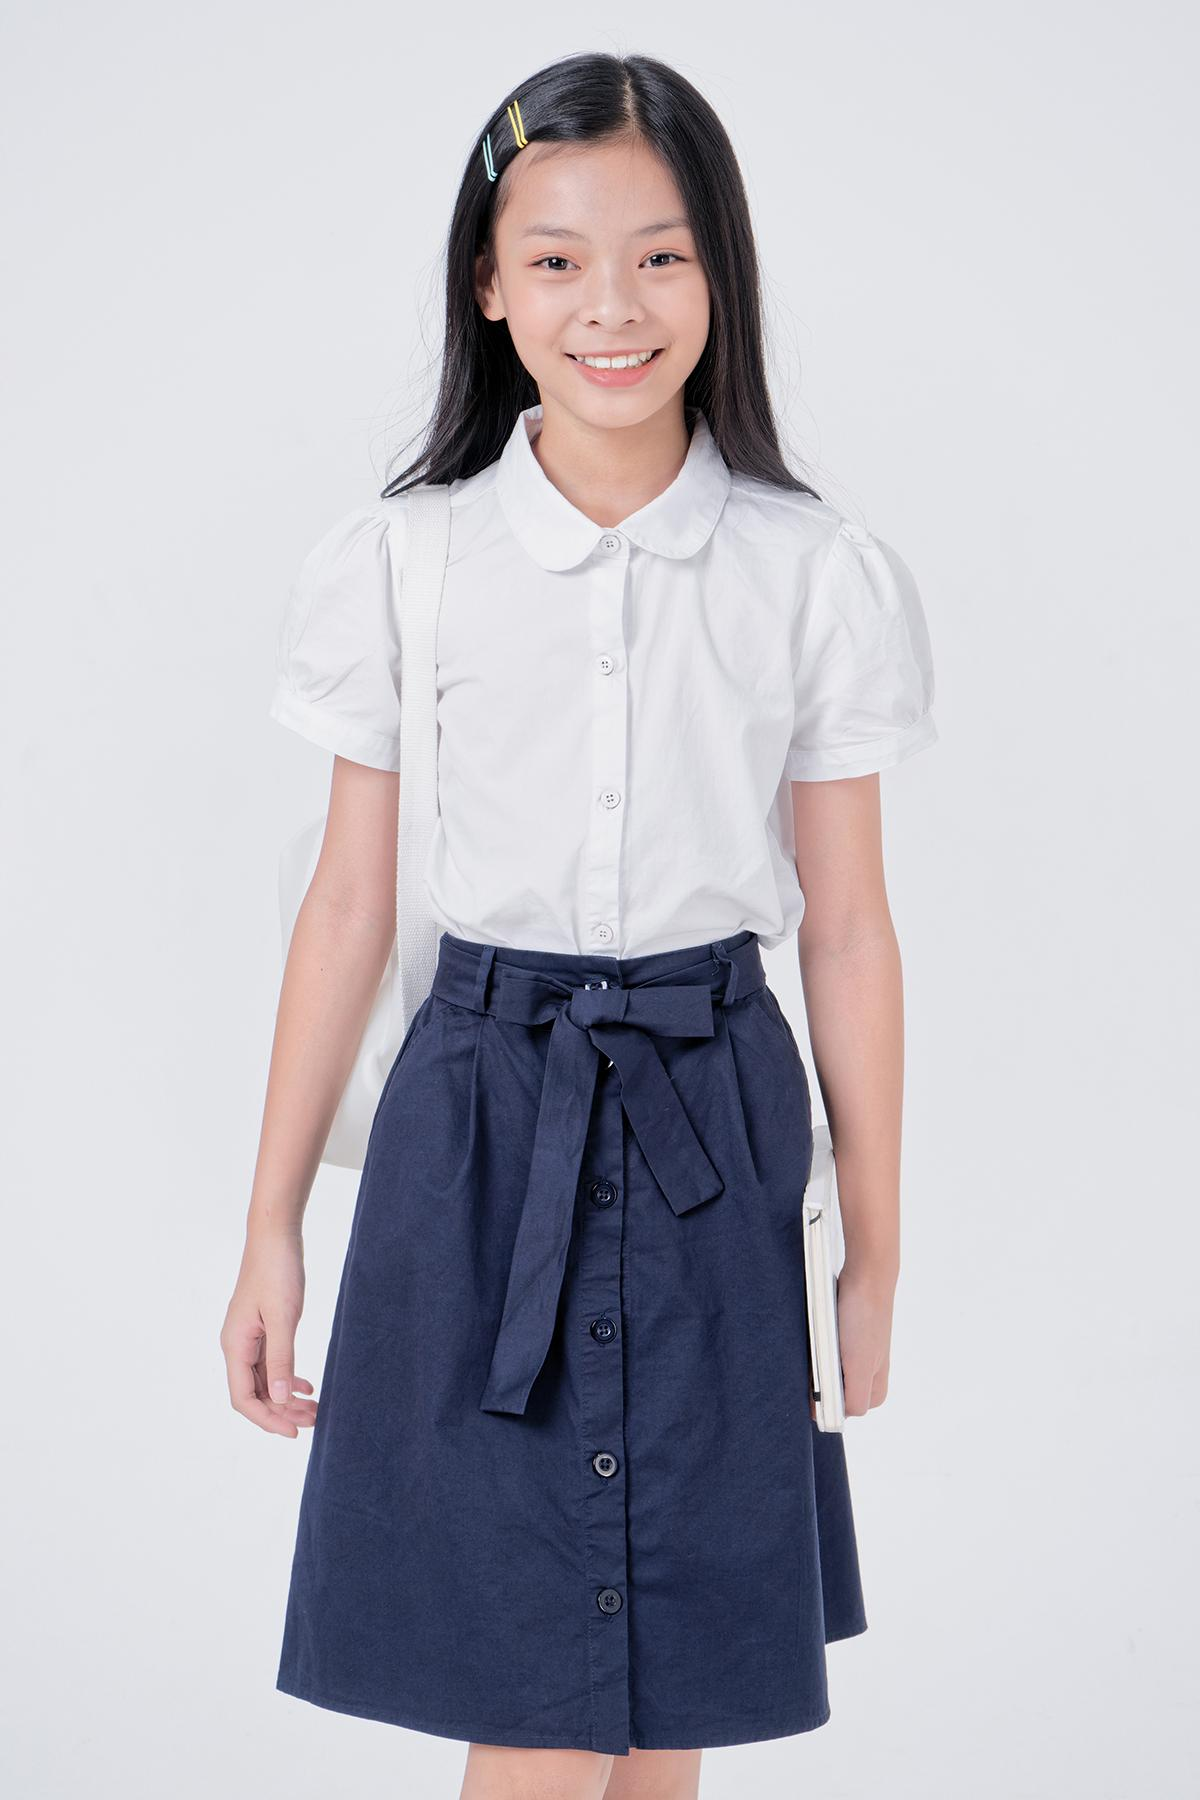 Giá bán Chân Váy Sơ Mi Bé Gái (6-14 Tuổi) Ks Closet